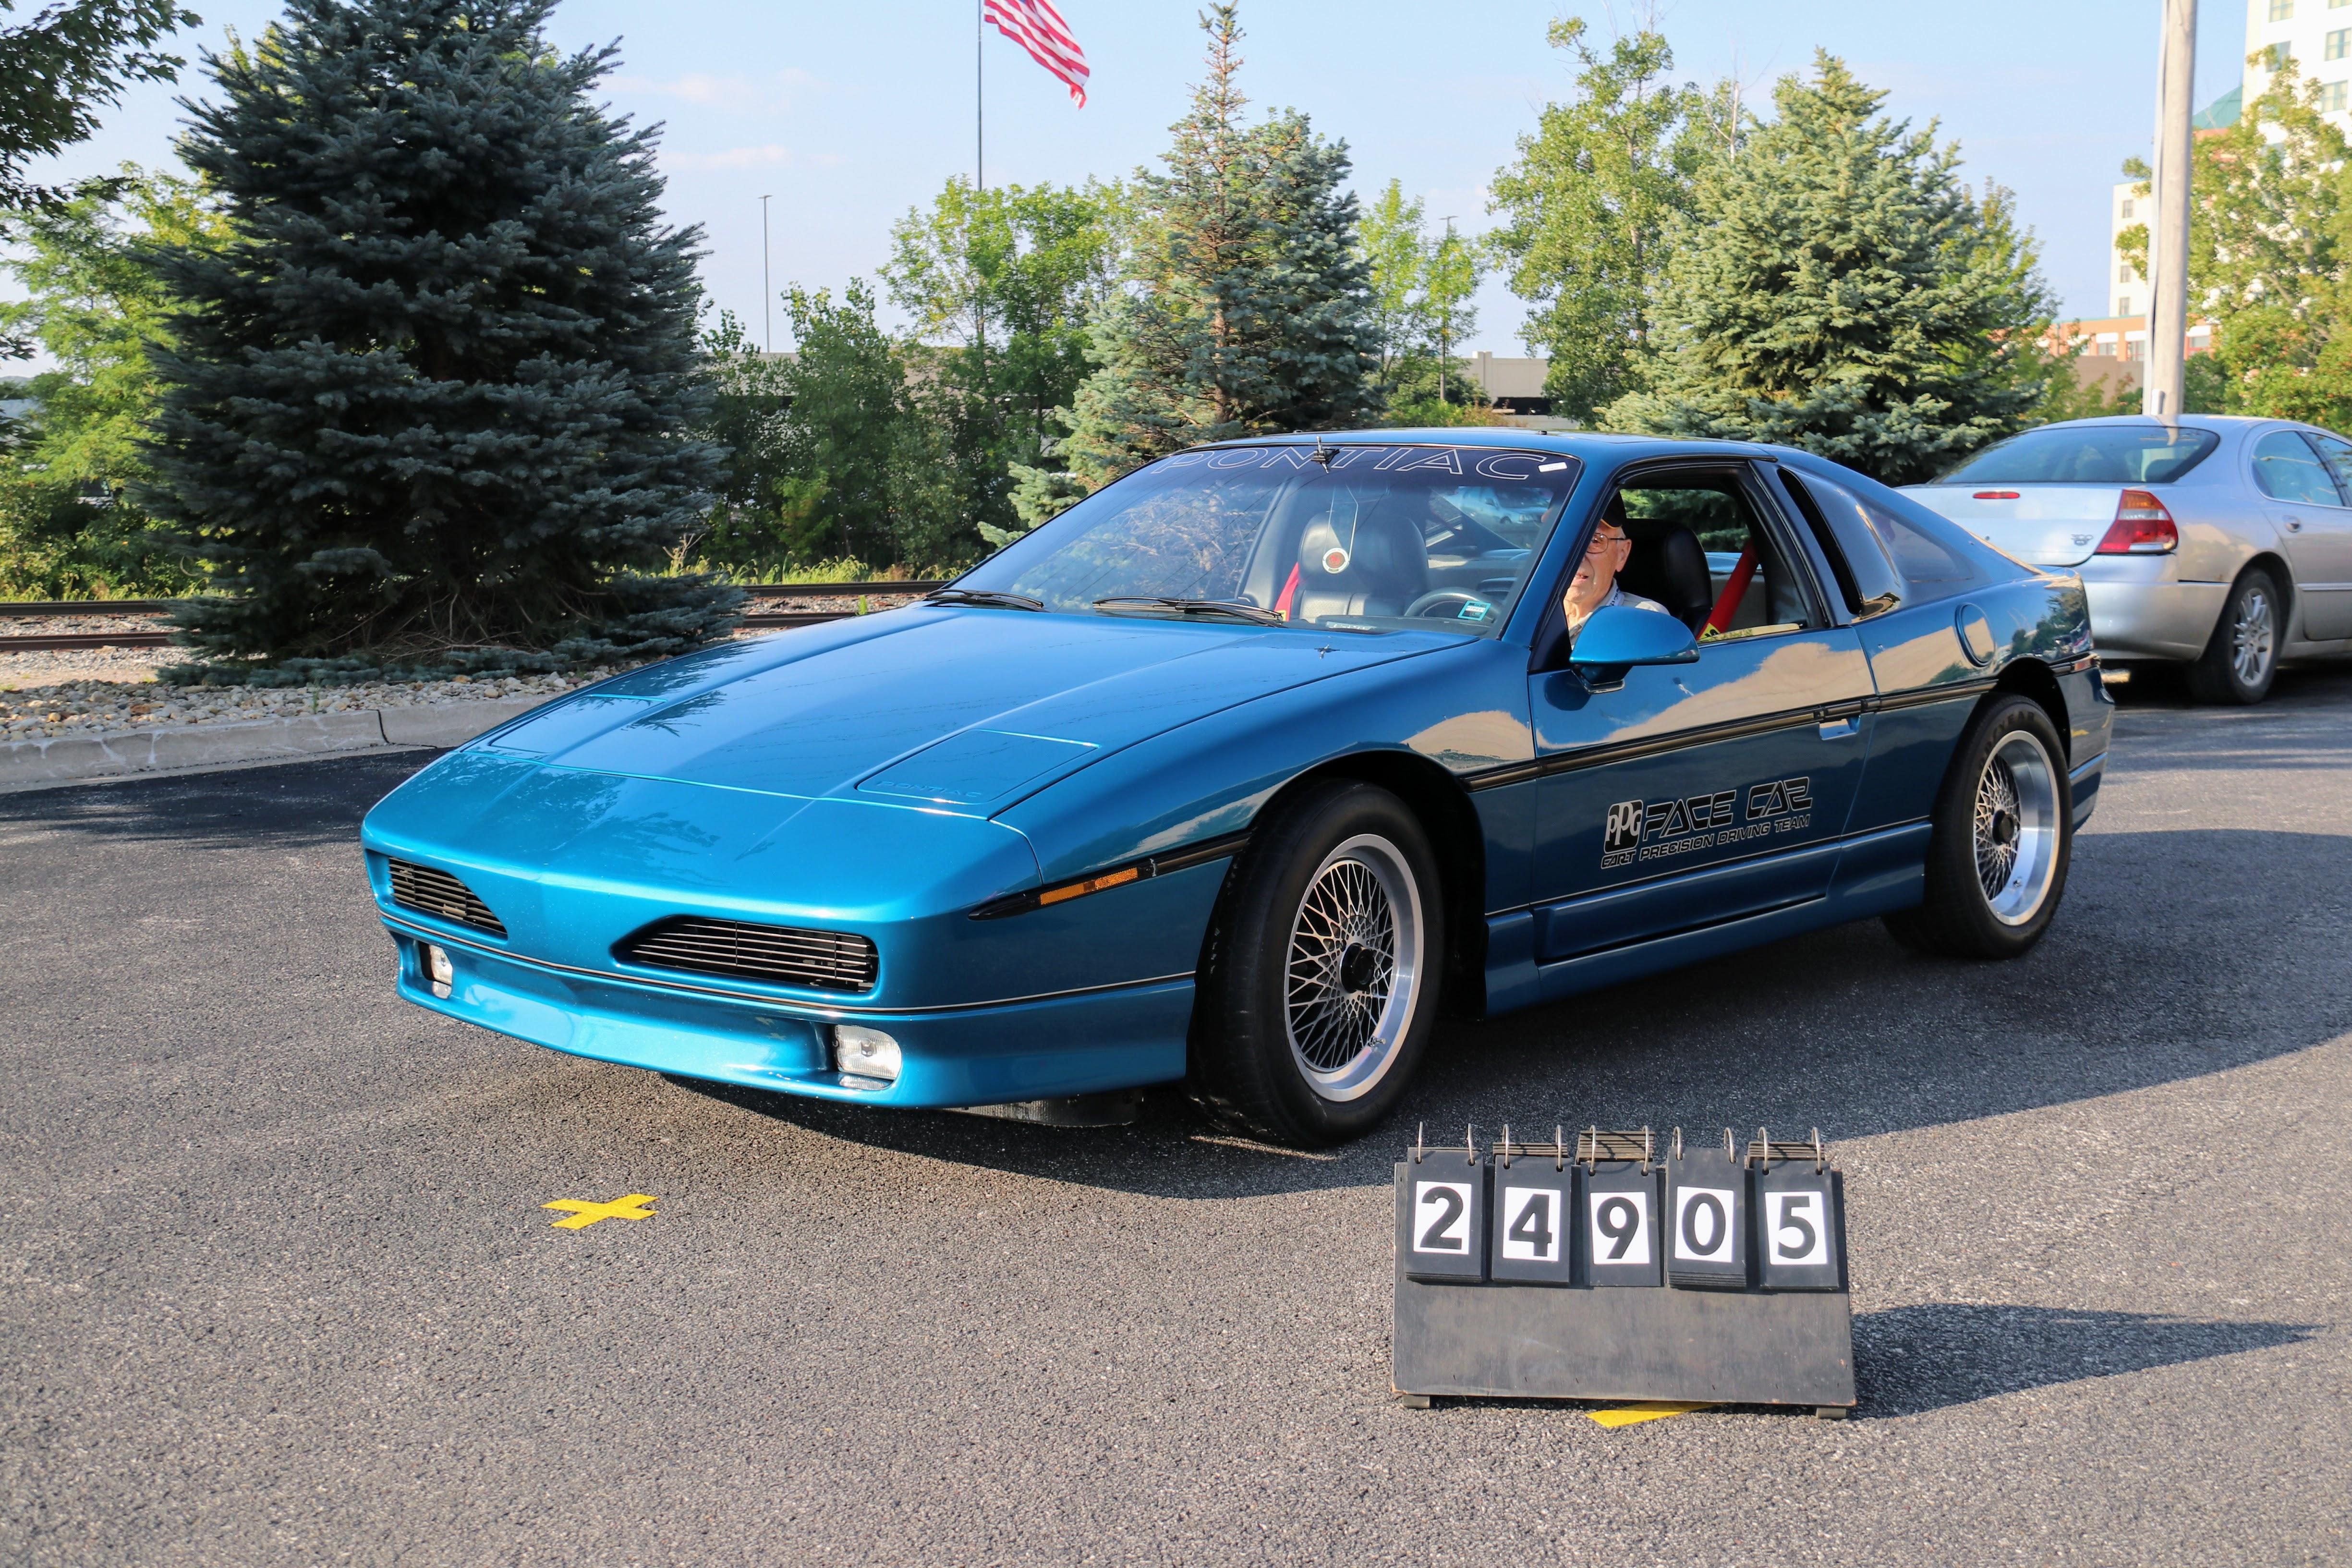 1985-Pontiac-Fiero-PPG-GTP-Pace-Car-Prototype